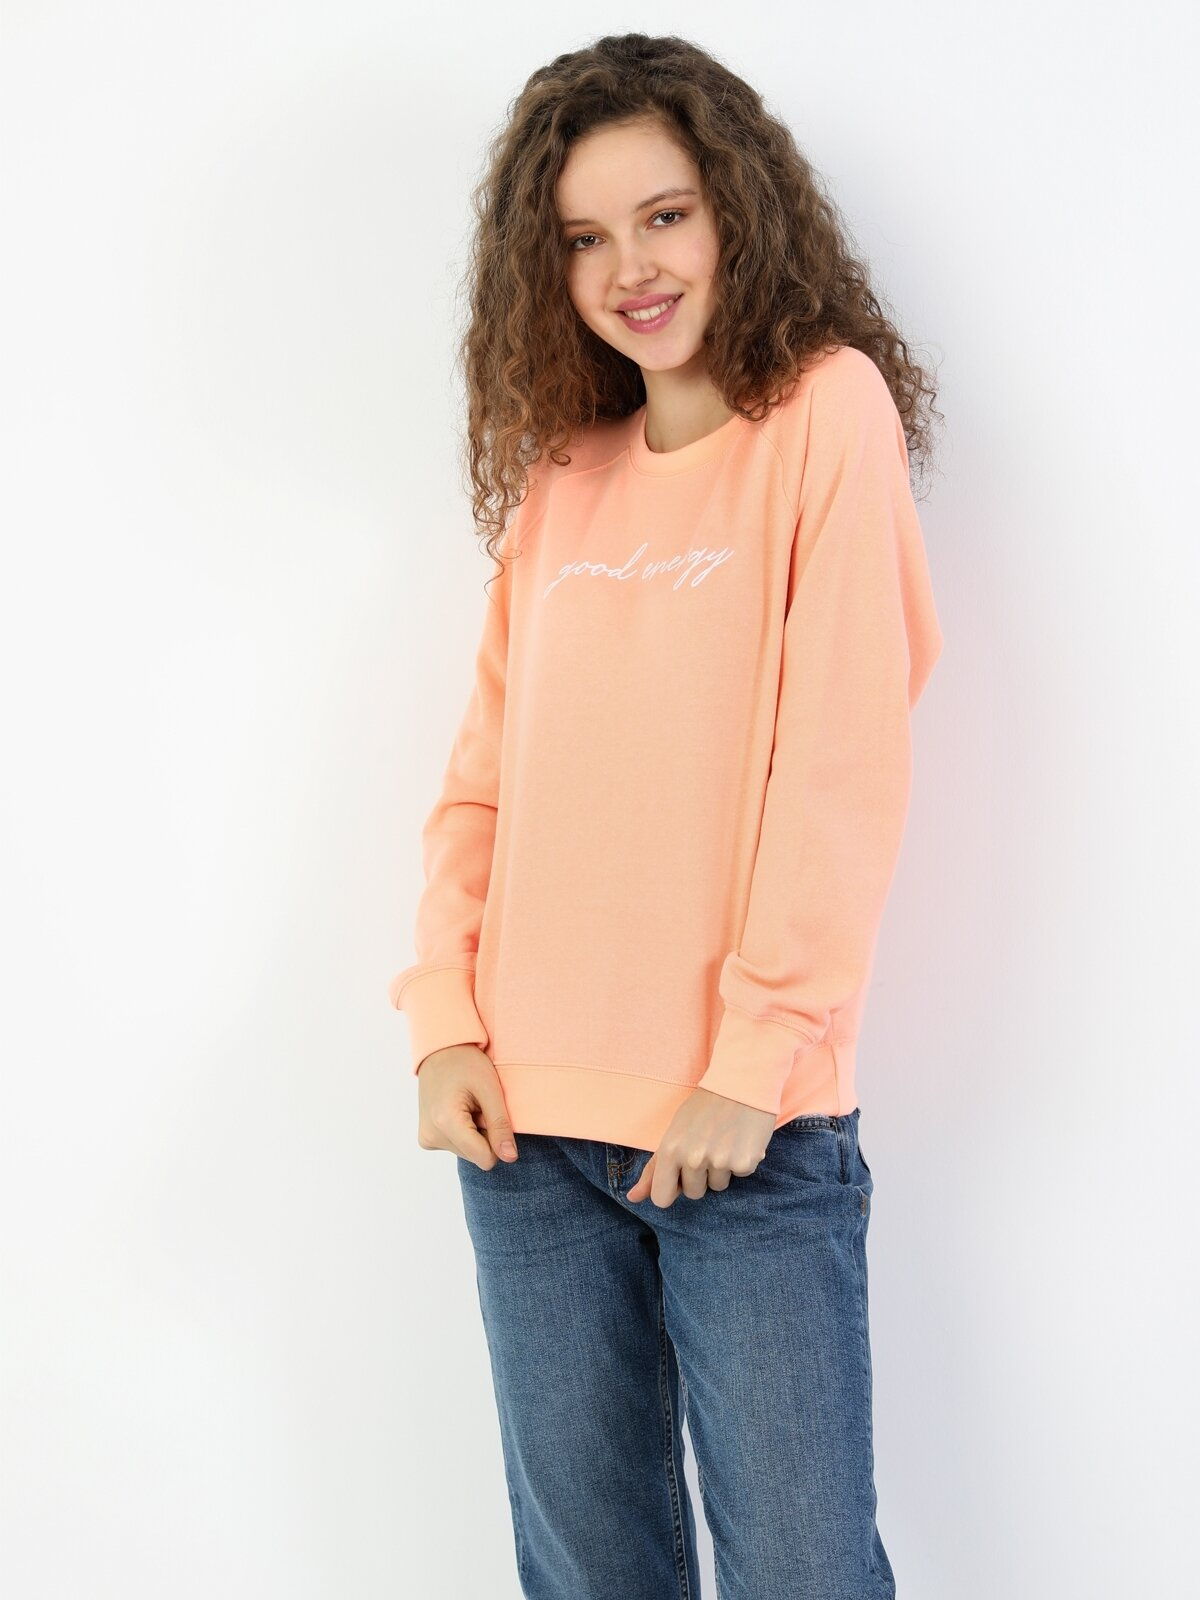 Regular Fitkadın Sweatshirt